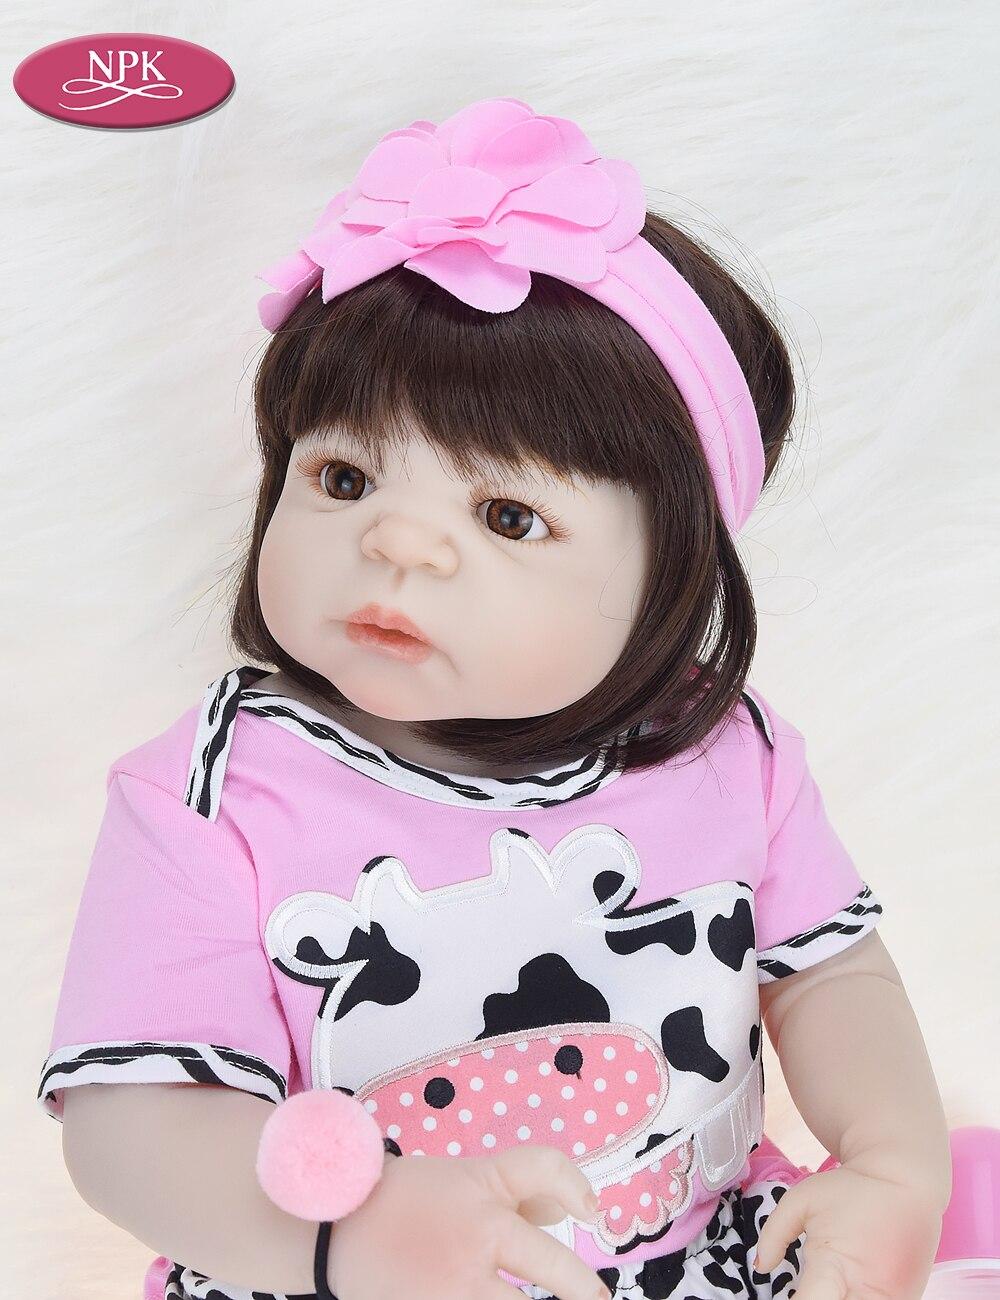 NPK Real 57CM Full Body SIlicone Girl Reborn Babies Doll Bath Toy Lifelike Newborn Princess Baby Doll Bonecas Bebe Reborn Menina (8)